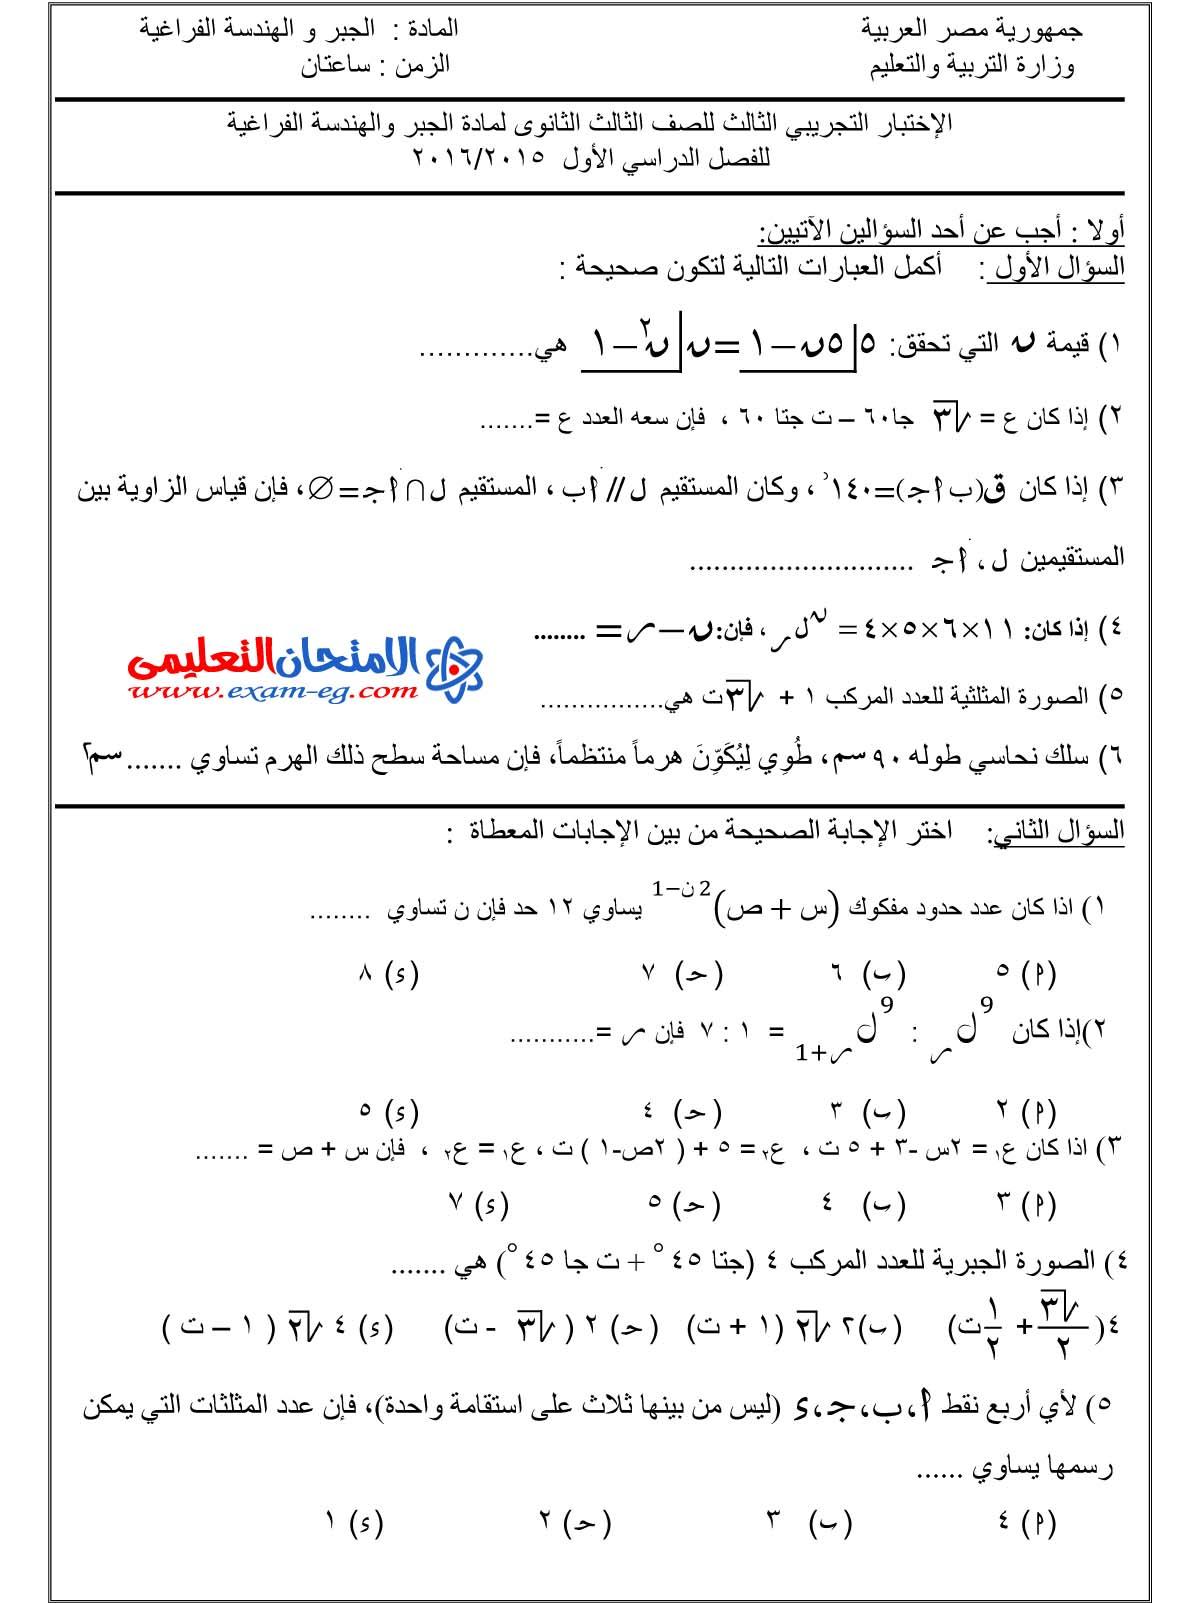 exam-eg.com_1460421183145.jpg